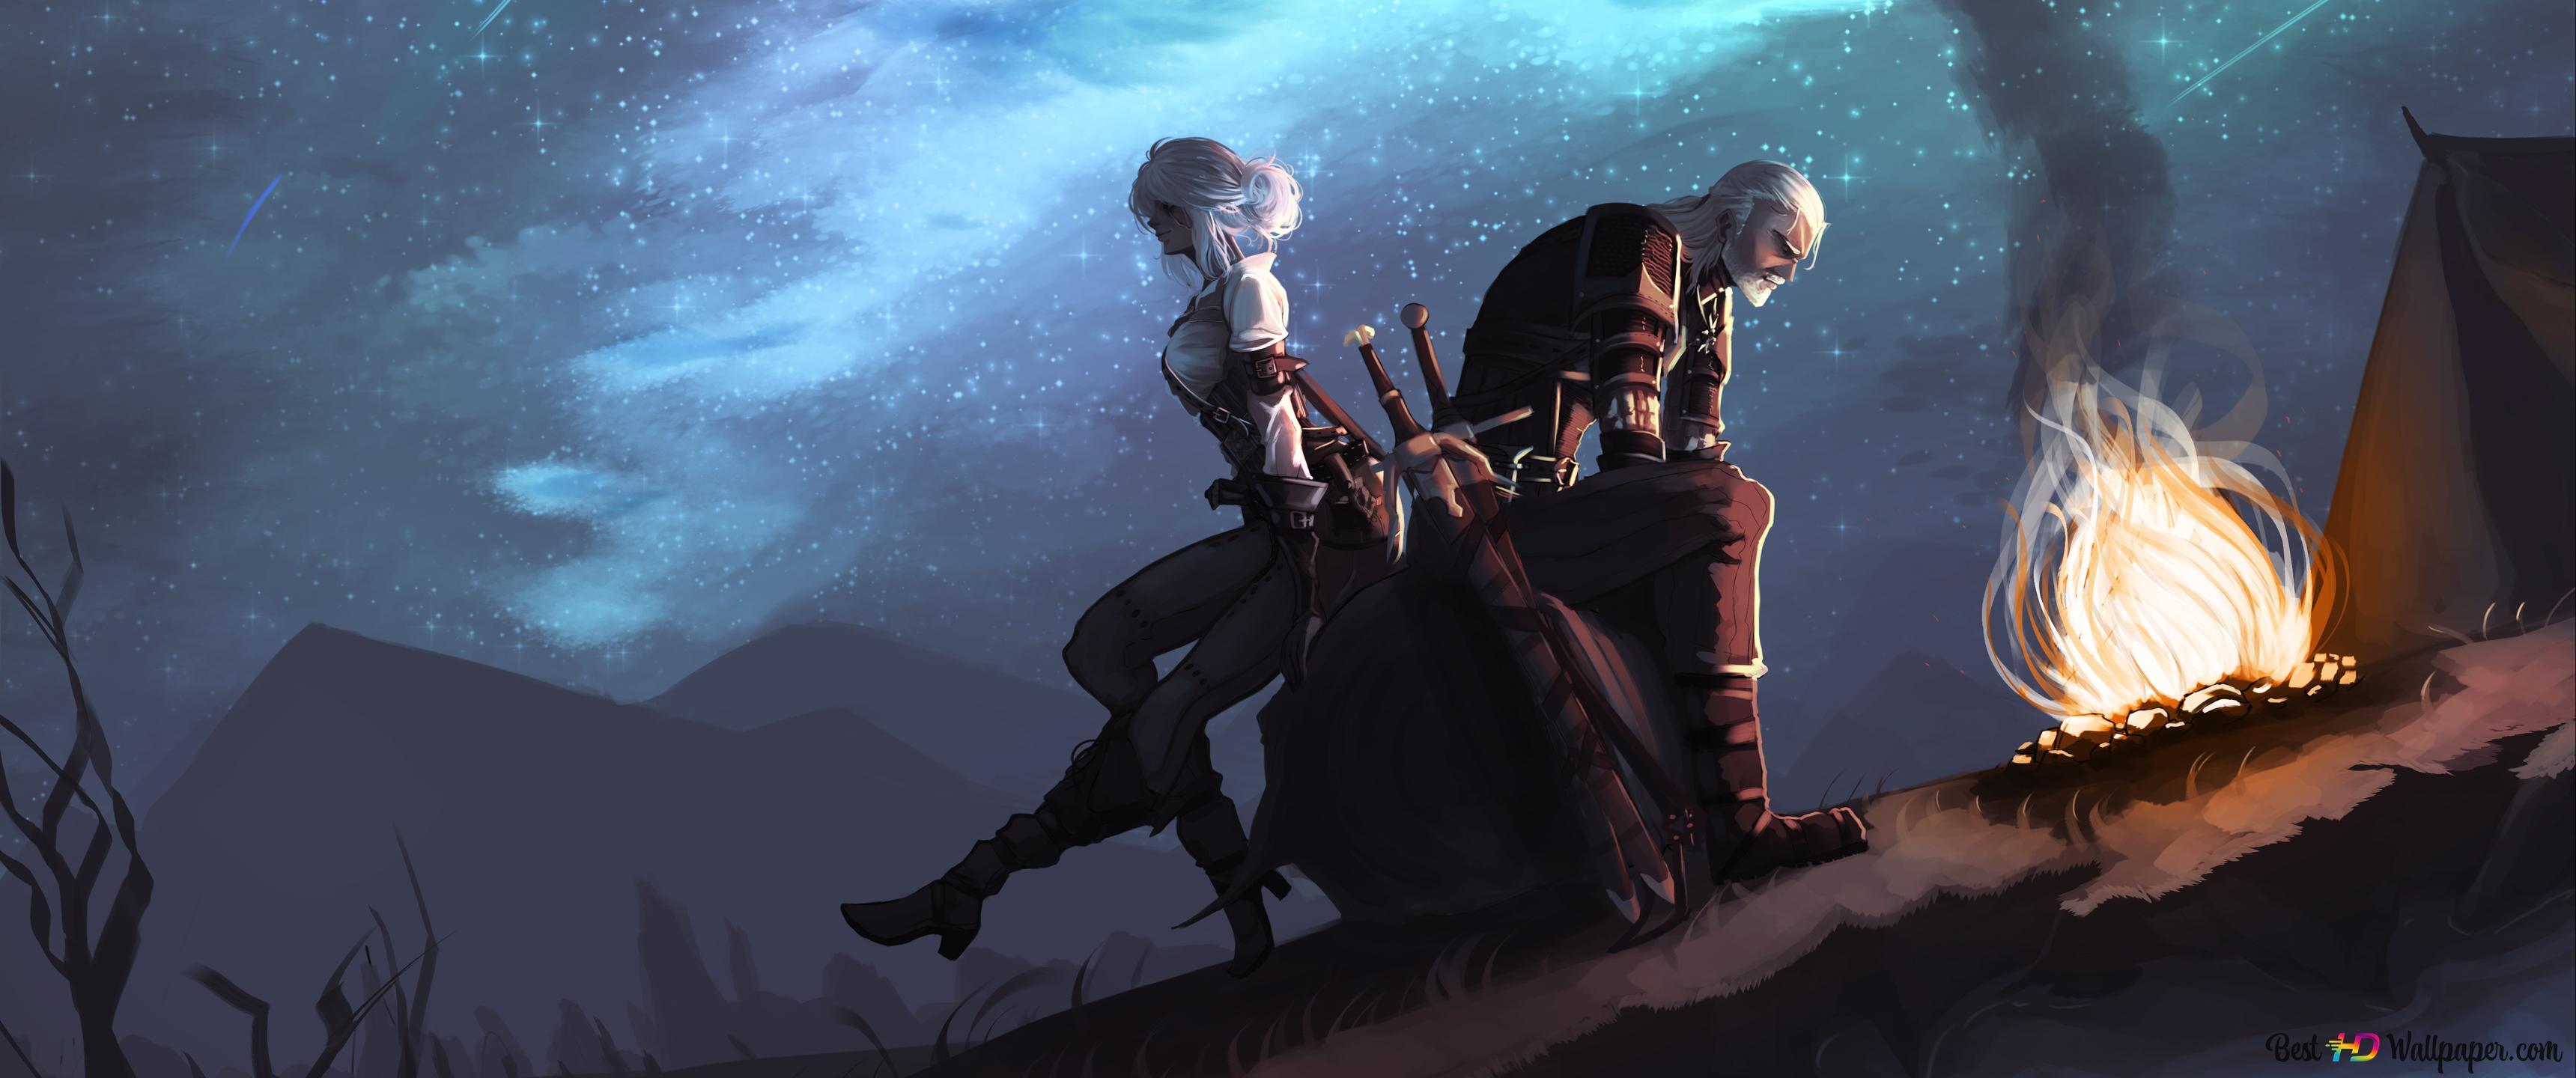 The Witcher 3 Wild Hunt Geralt Ciri Hd Wallpaper Download